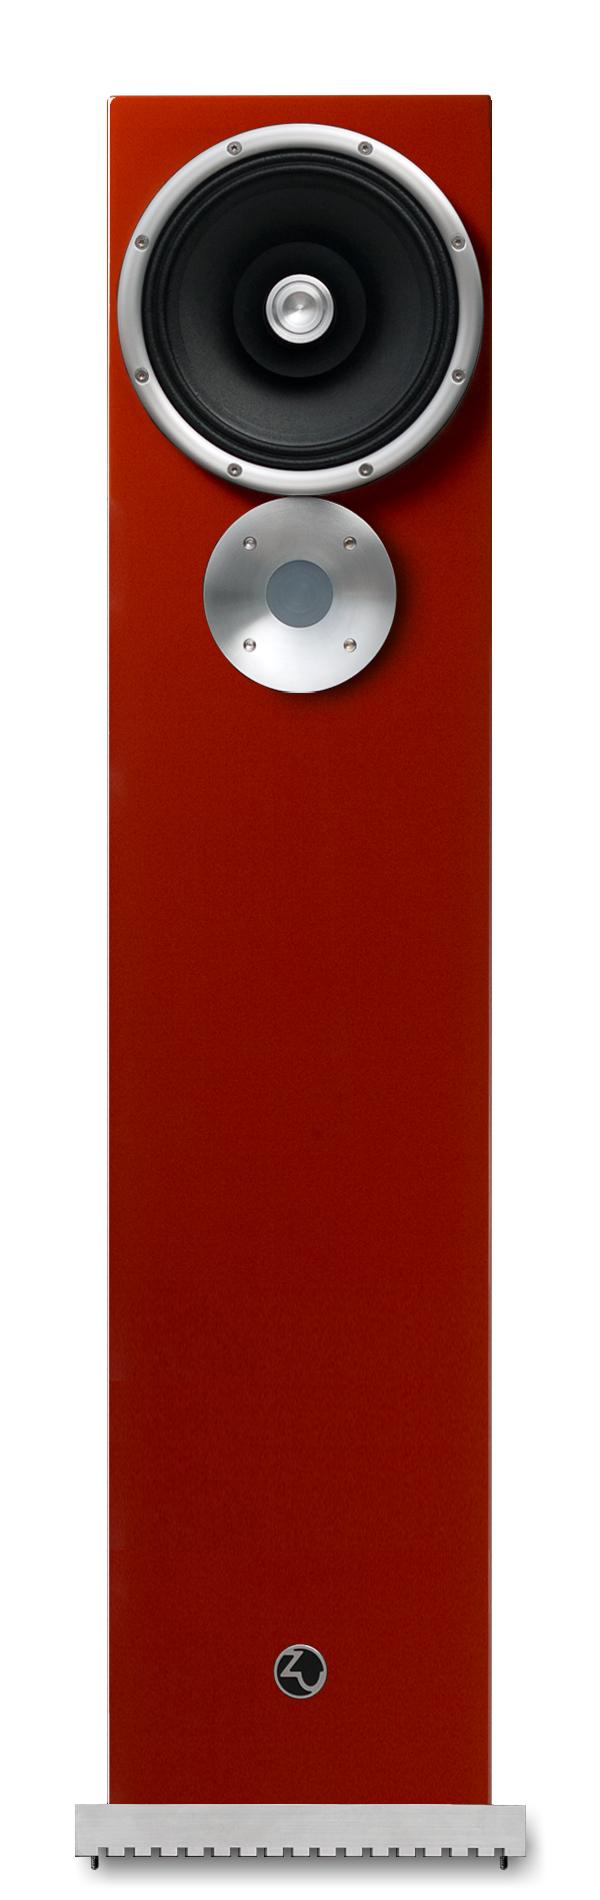 Druid Ferrari Red